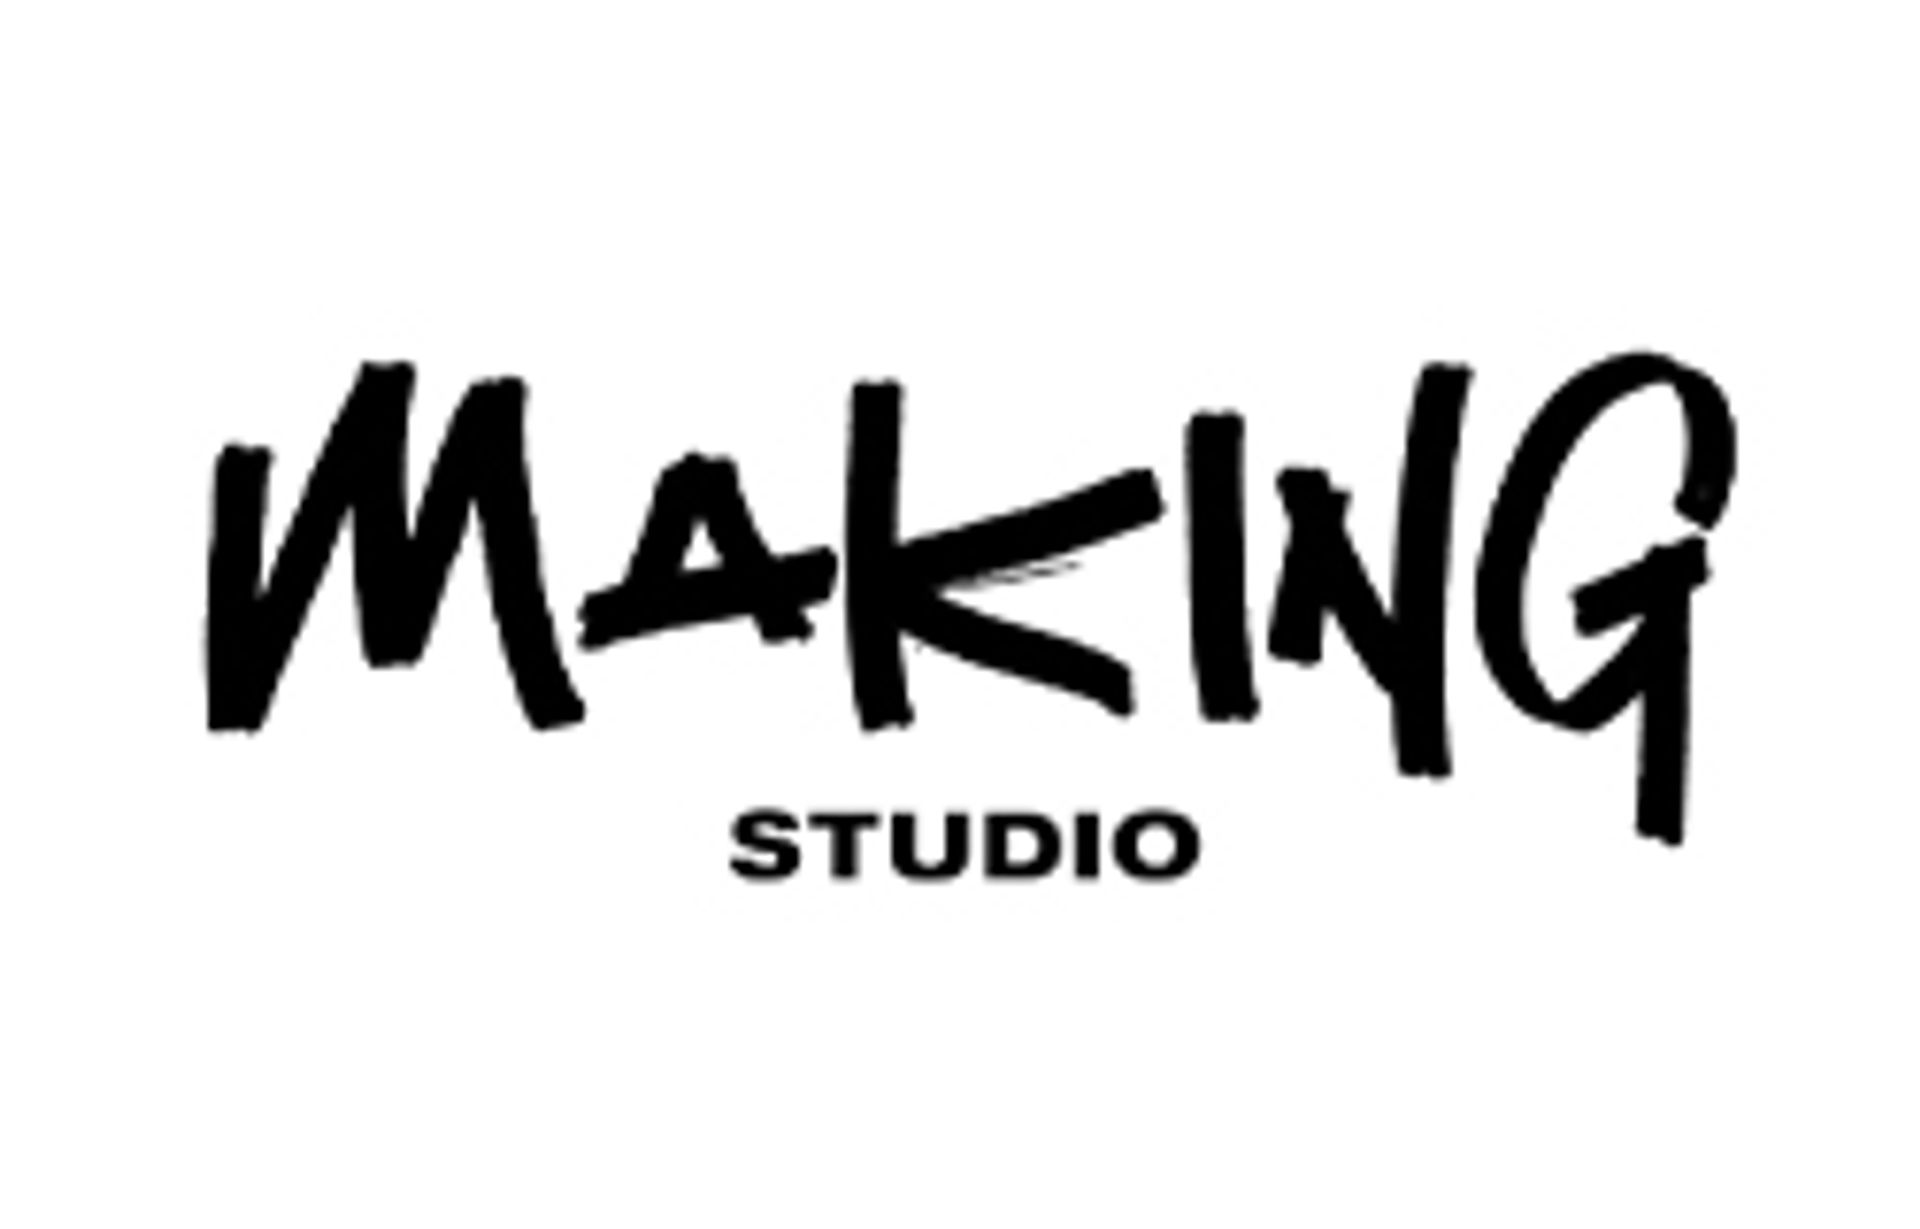 Making Studio di Secomandi Gian Pietro